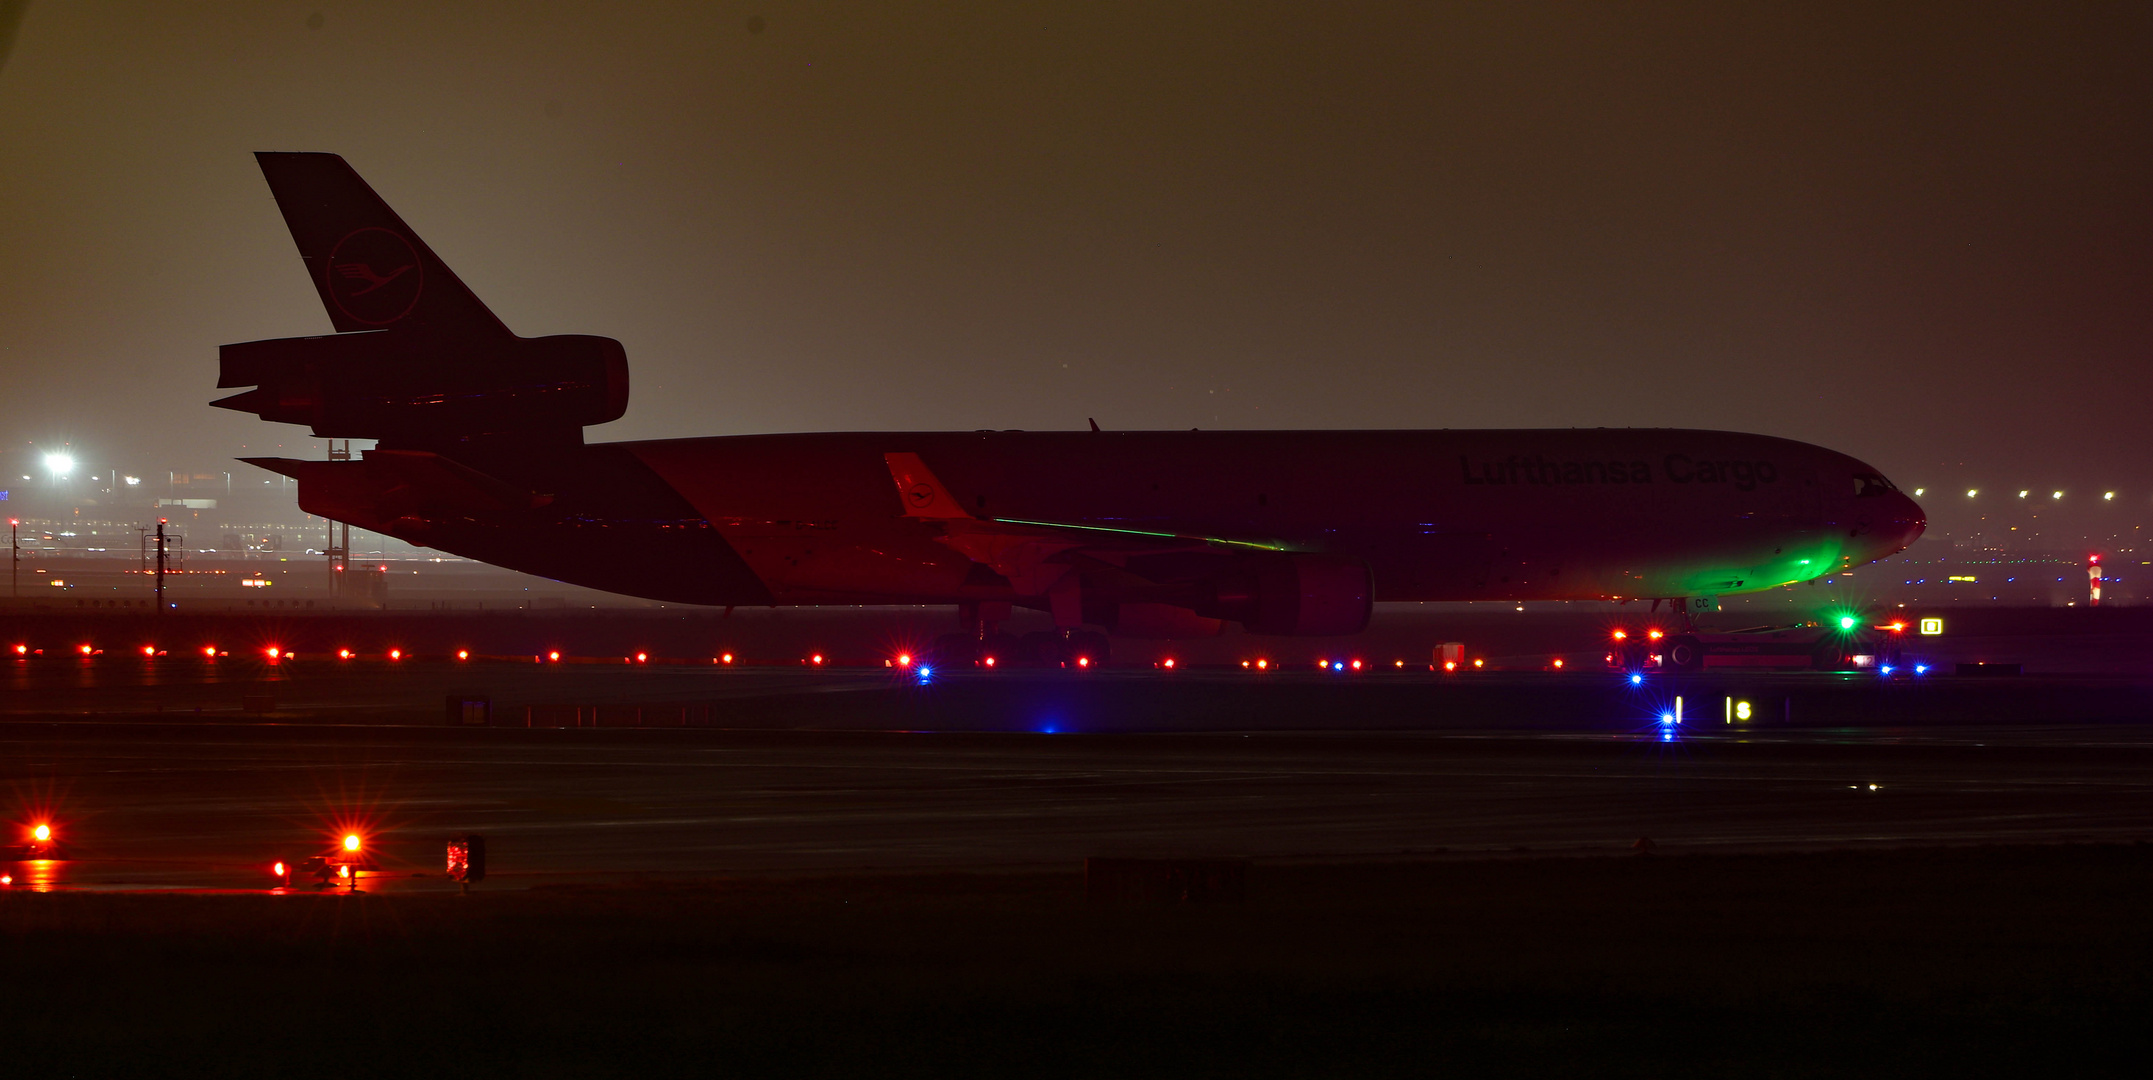 MD11 by Night